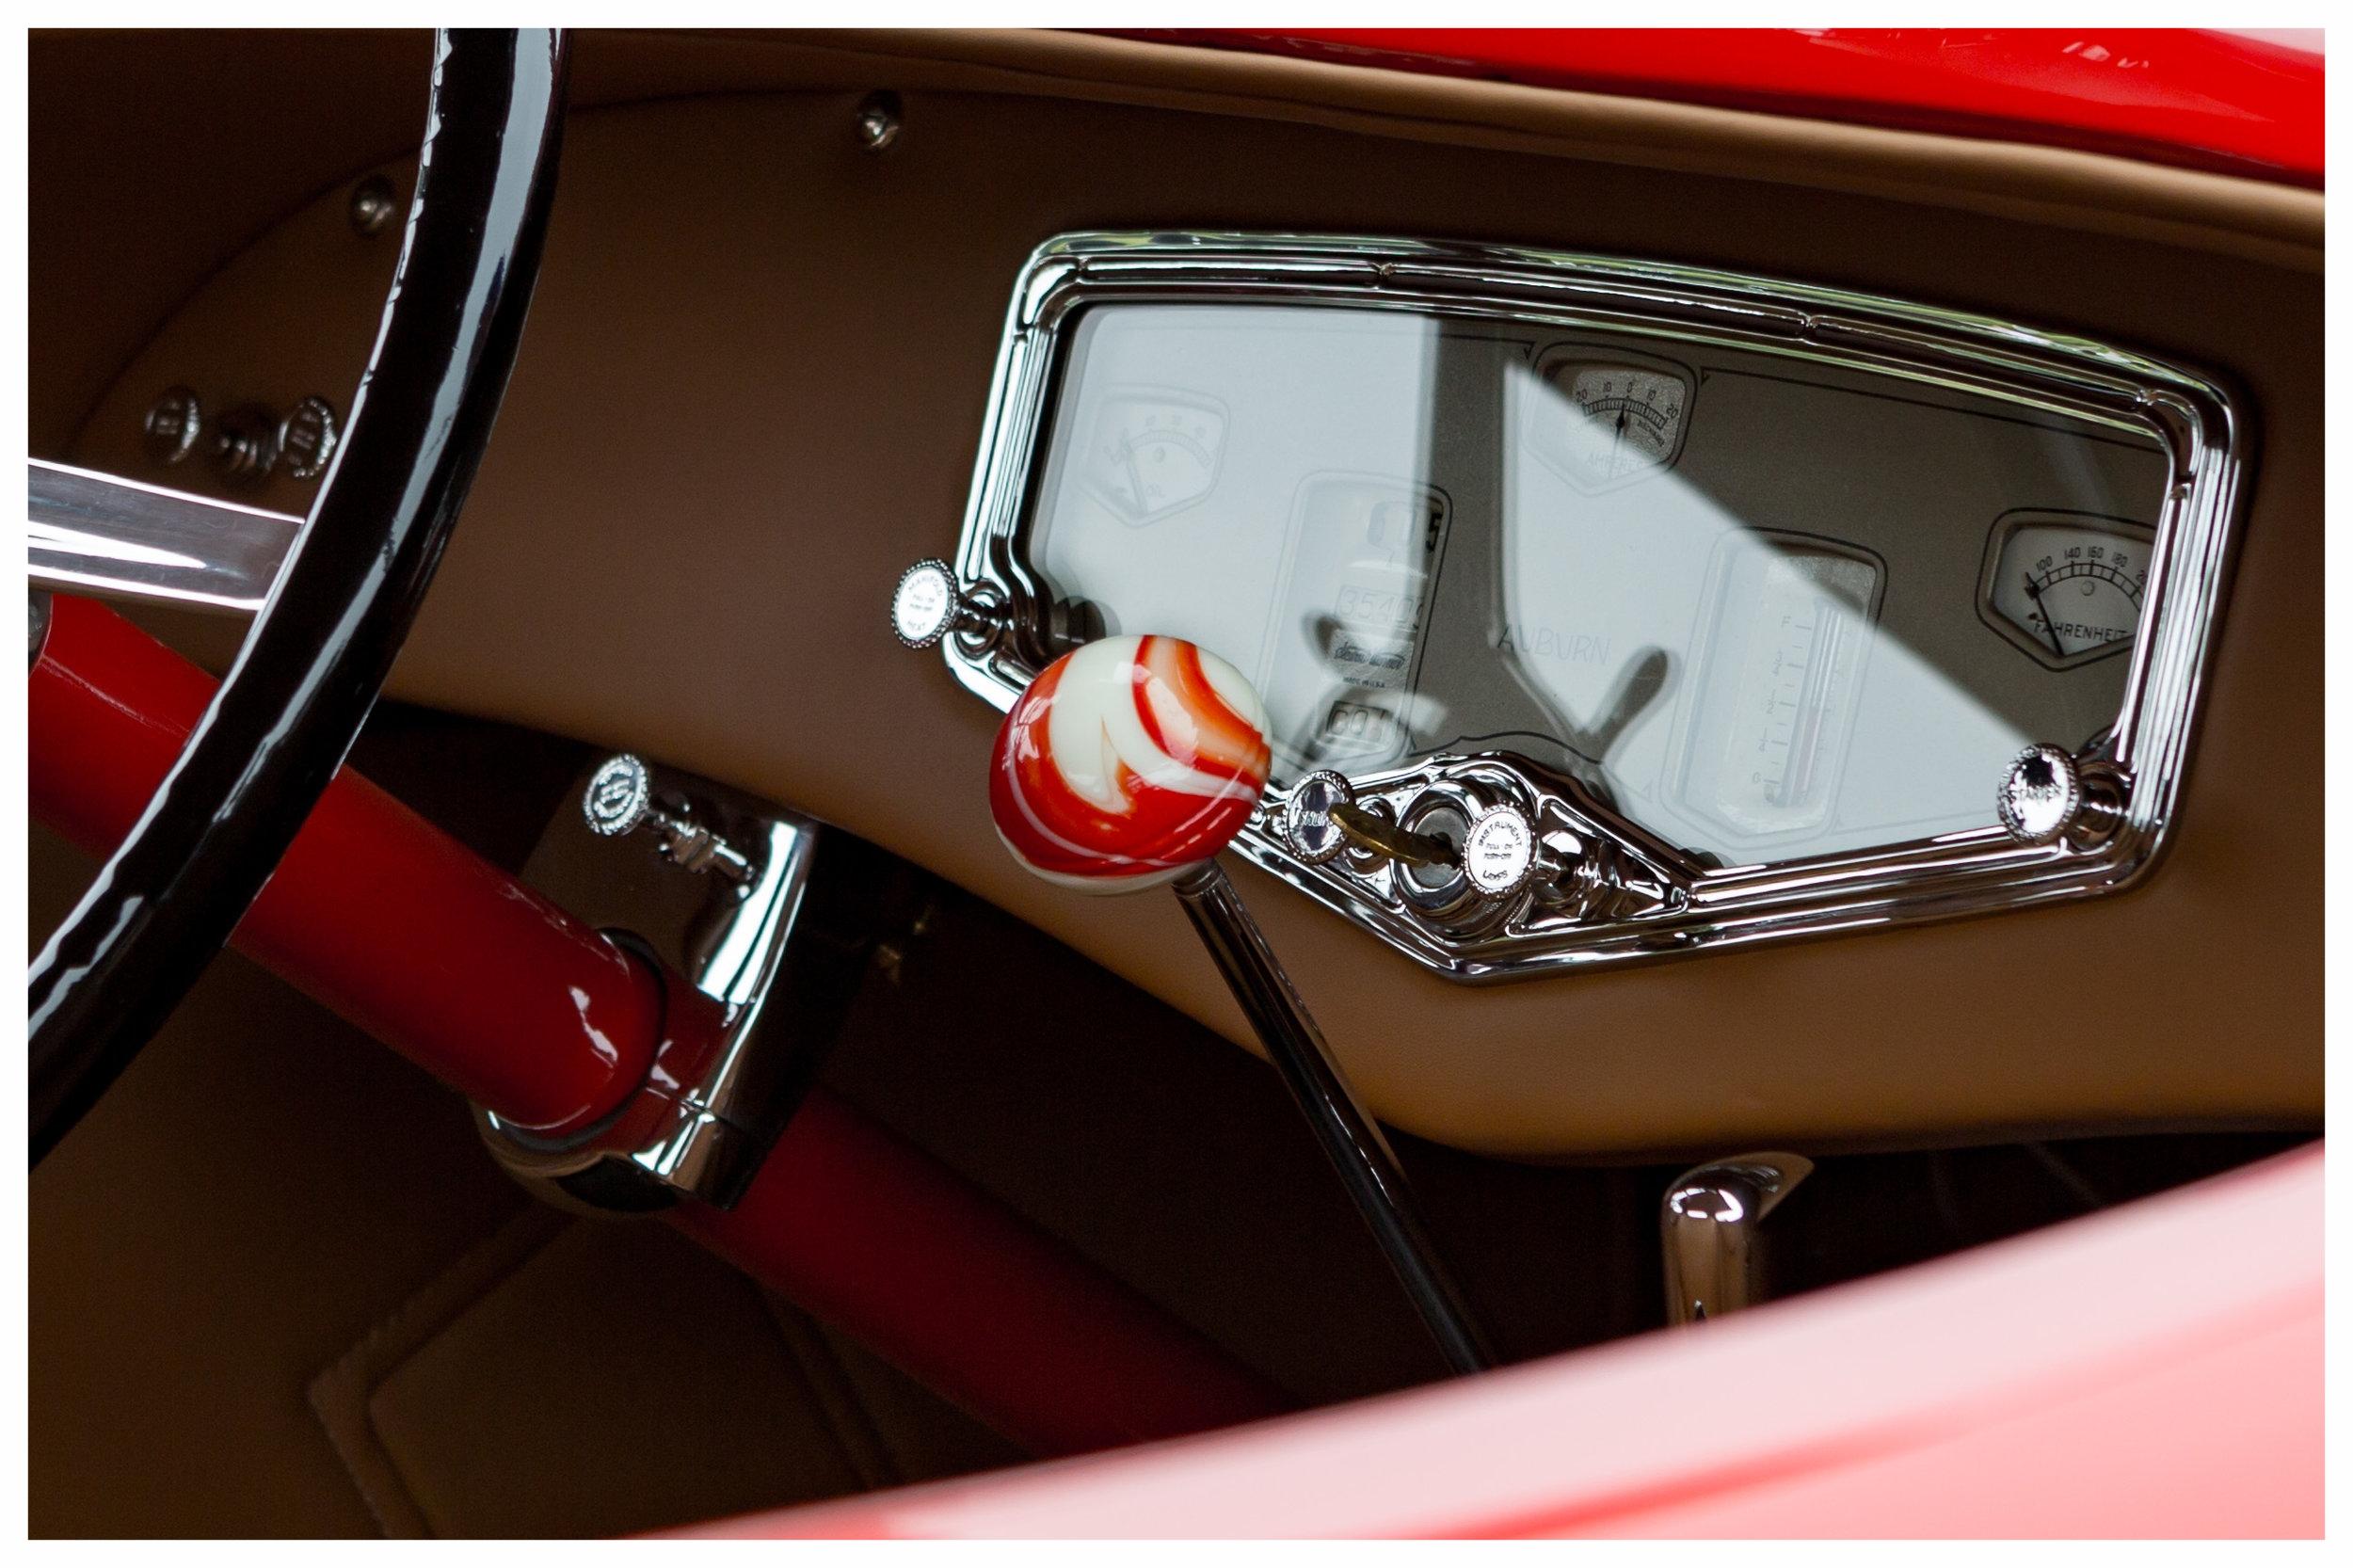 Barrett Jackson Car Show-25.jpg